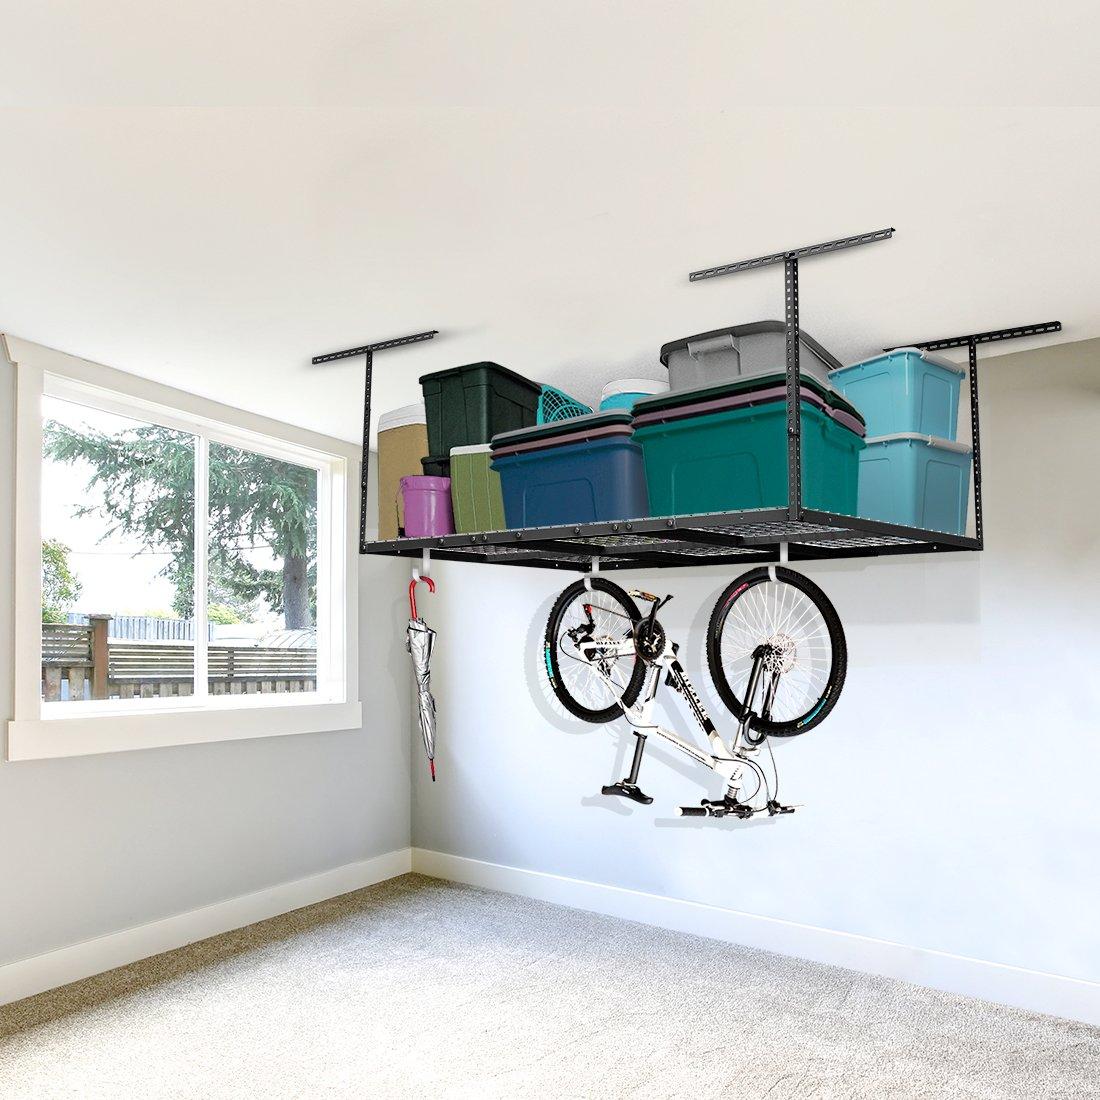 FLEXIMOUNTS 4x6 Heavy Duty Overhead Garage Adjustable Ceiling Storage Rack, 72'' Length x 48'' Width x 40'' Height, Black